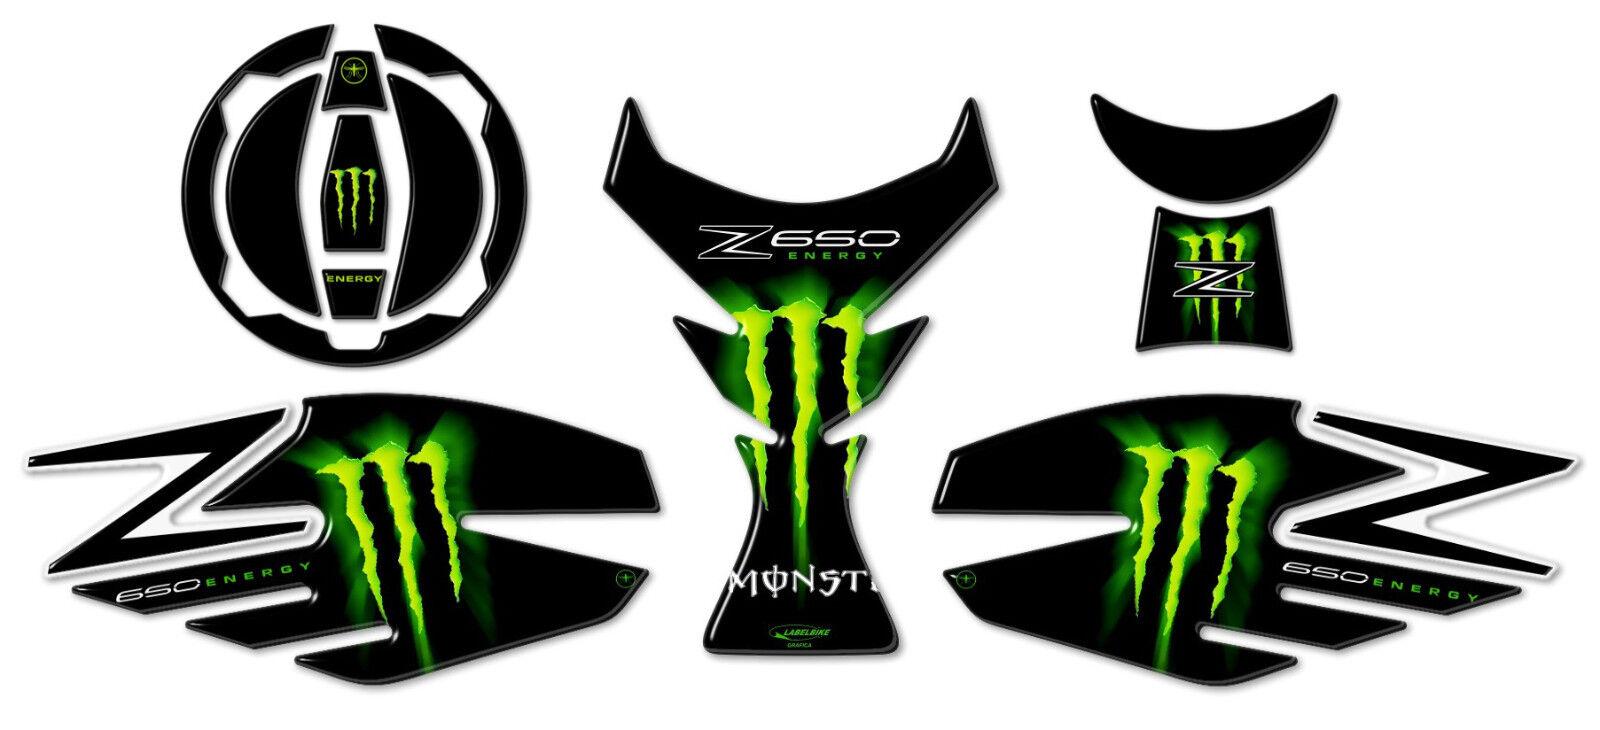 2 Stickers 3D Gel Tank Guard Compatible Motorcycle Kawasaki Versys 1000